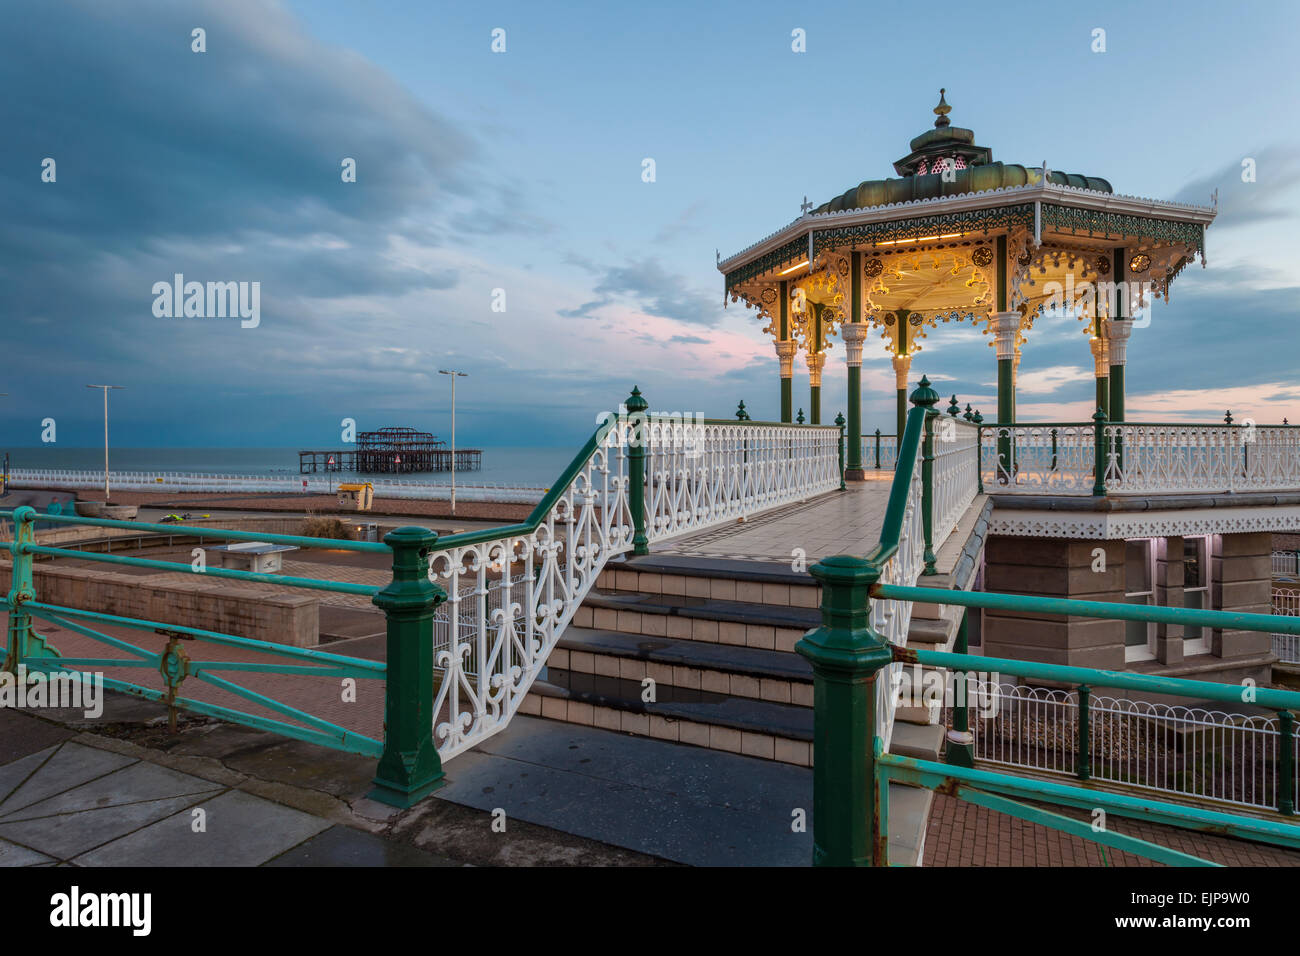 Noche en quiosco de Brighton, East Sussex, Inglaterra. Imagen De Stock